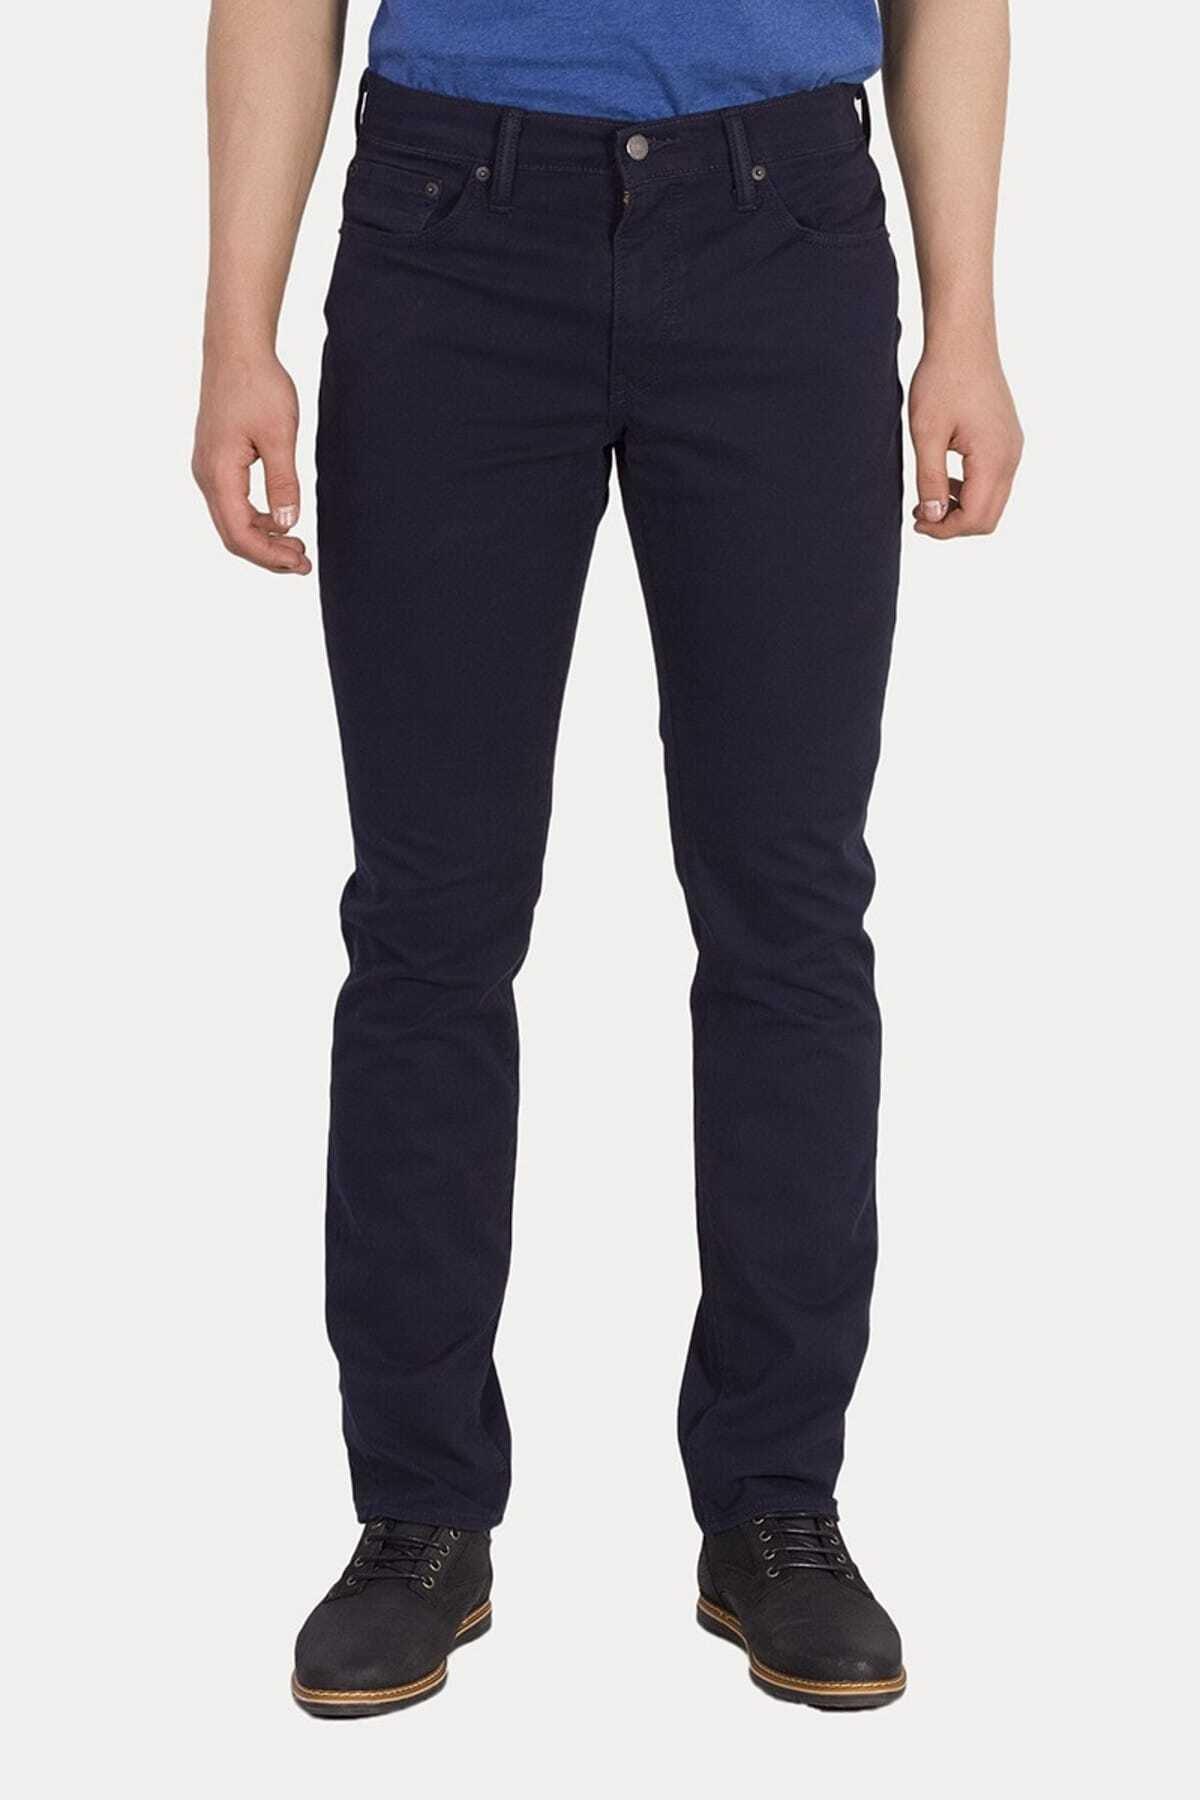 Levi's Erkek Jean 511 Slim Fit 04511-2617 1